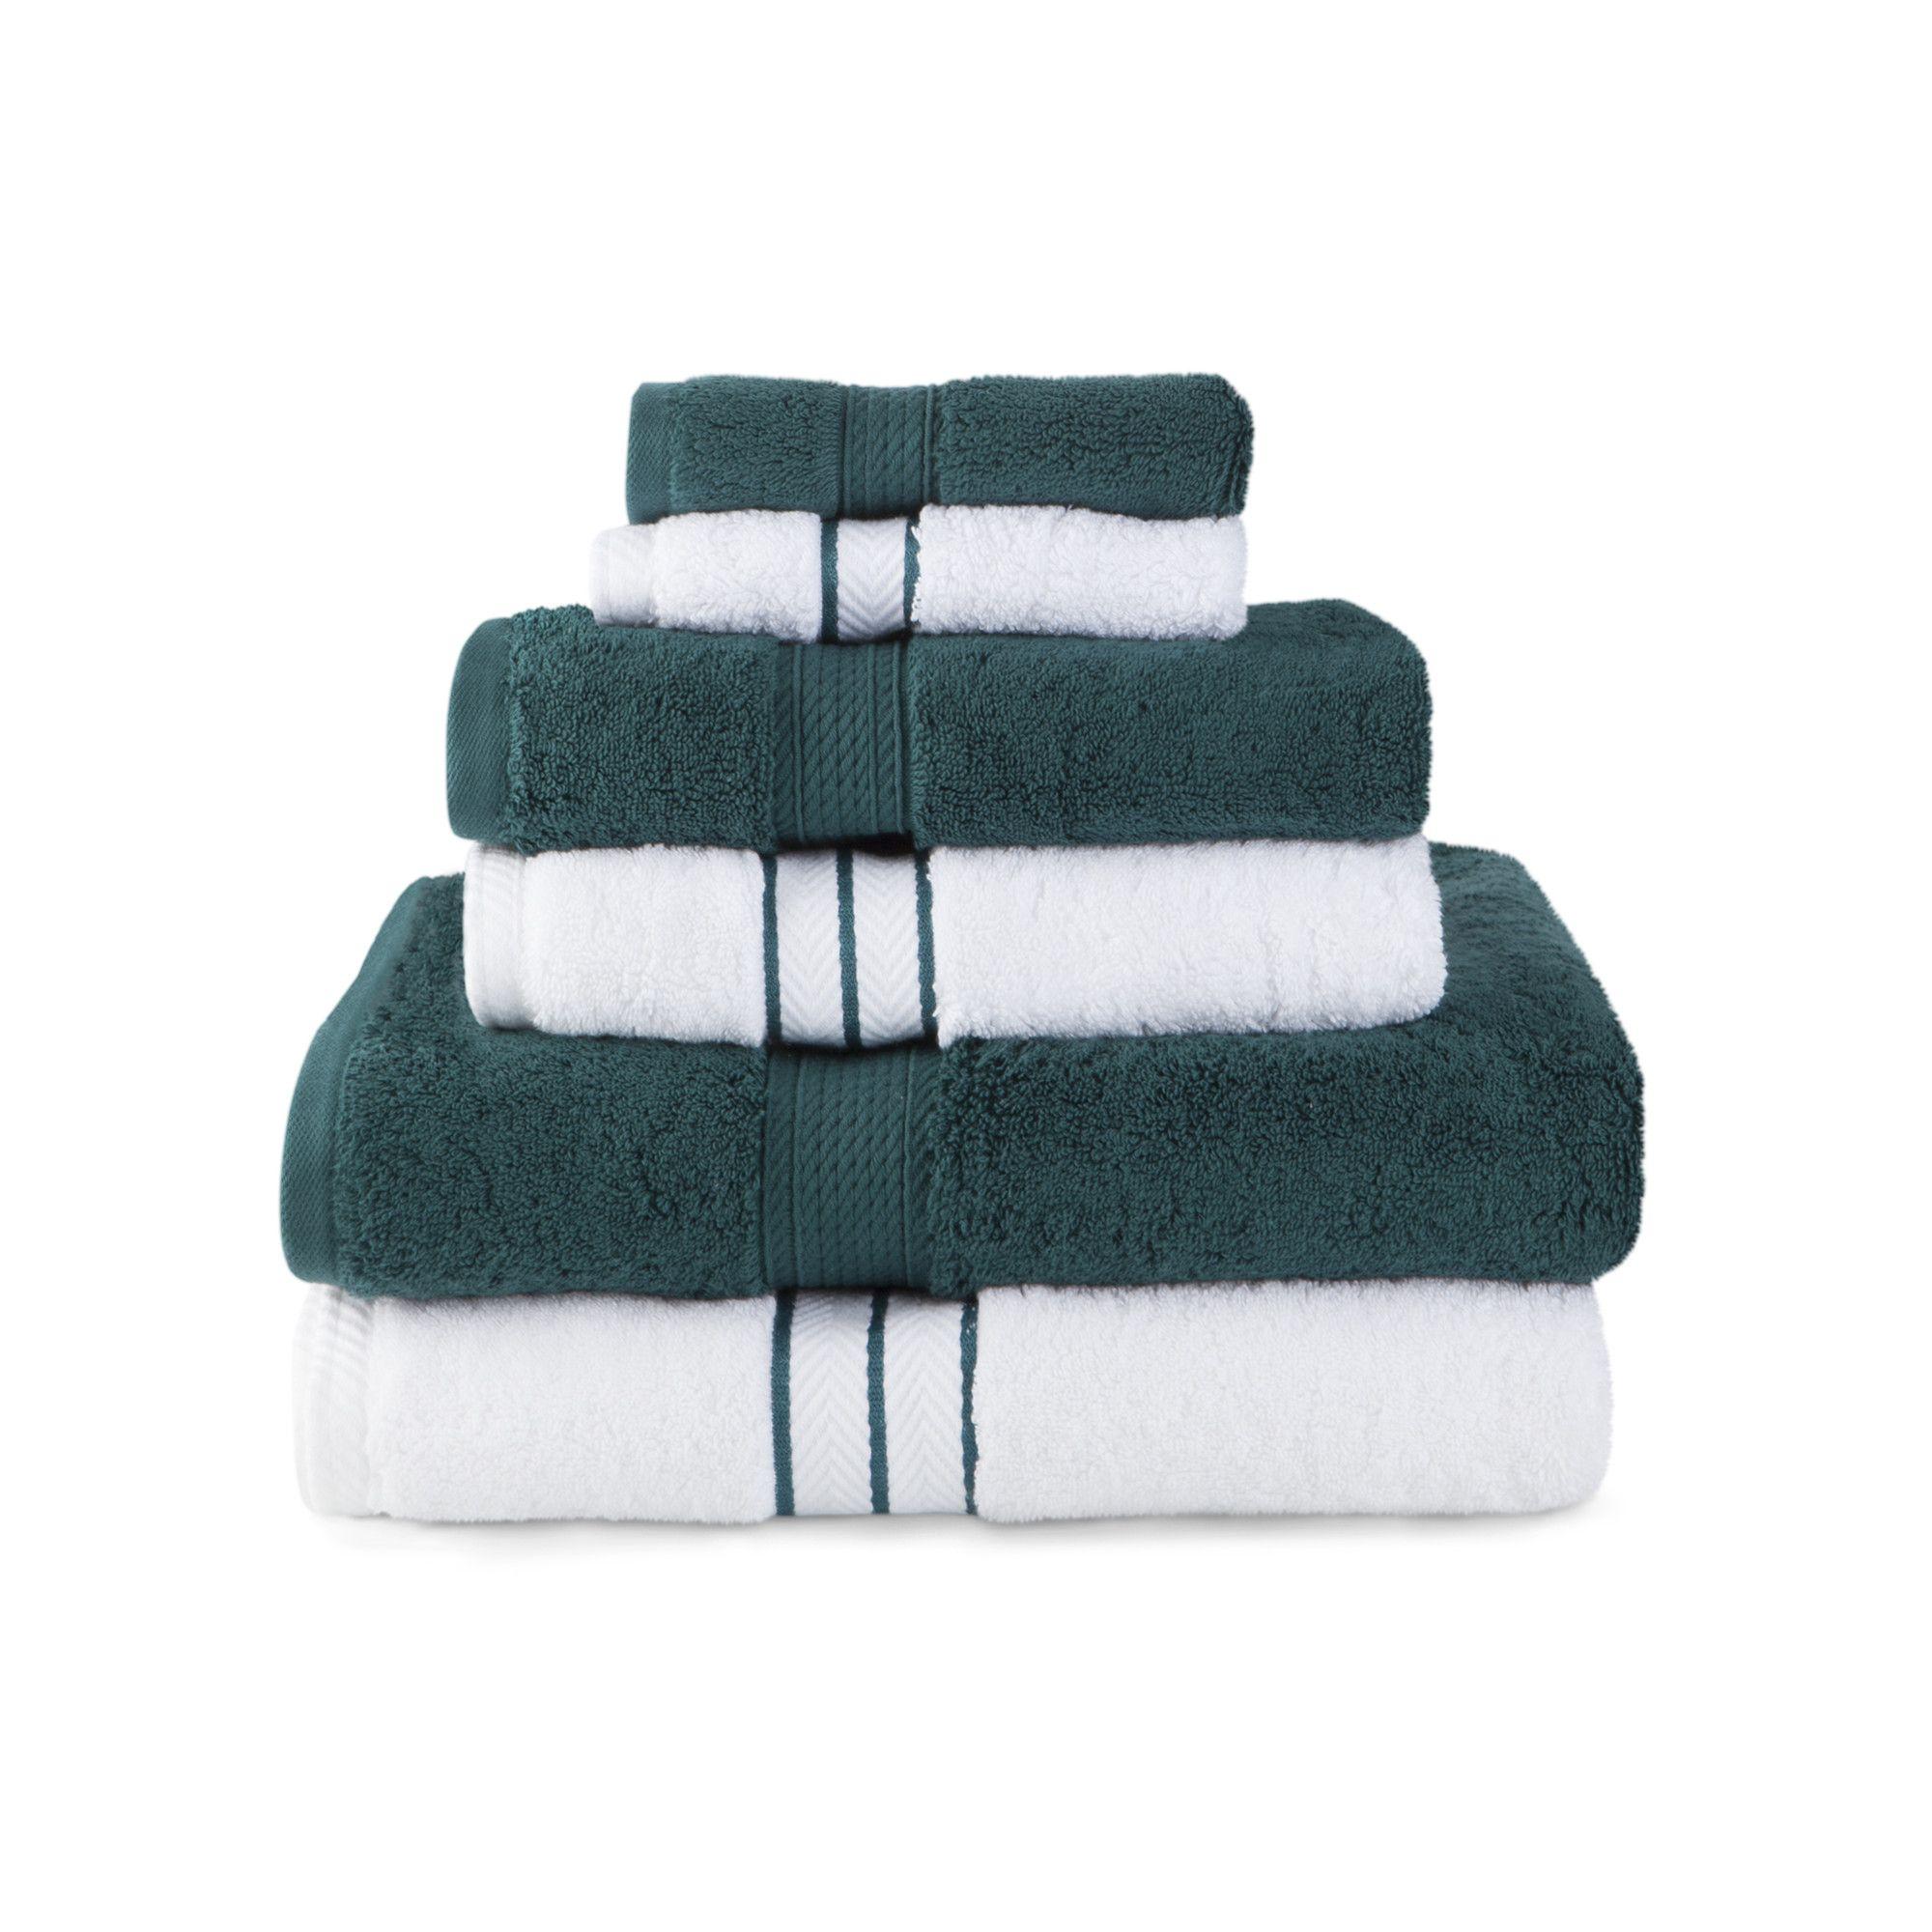 Veronica 6 Piece Towel Set Towel Set Luxury Towels Towel